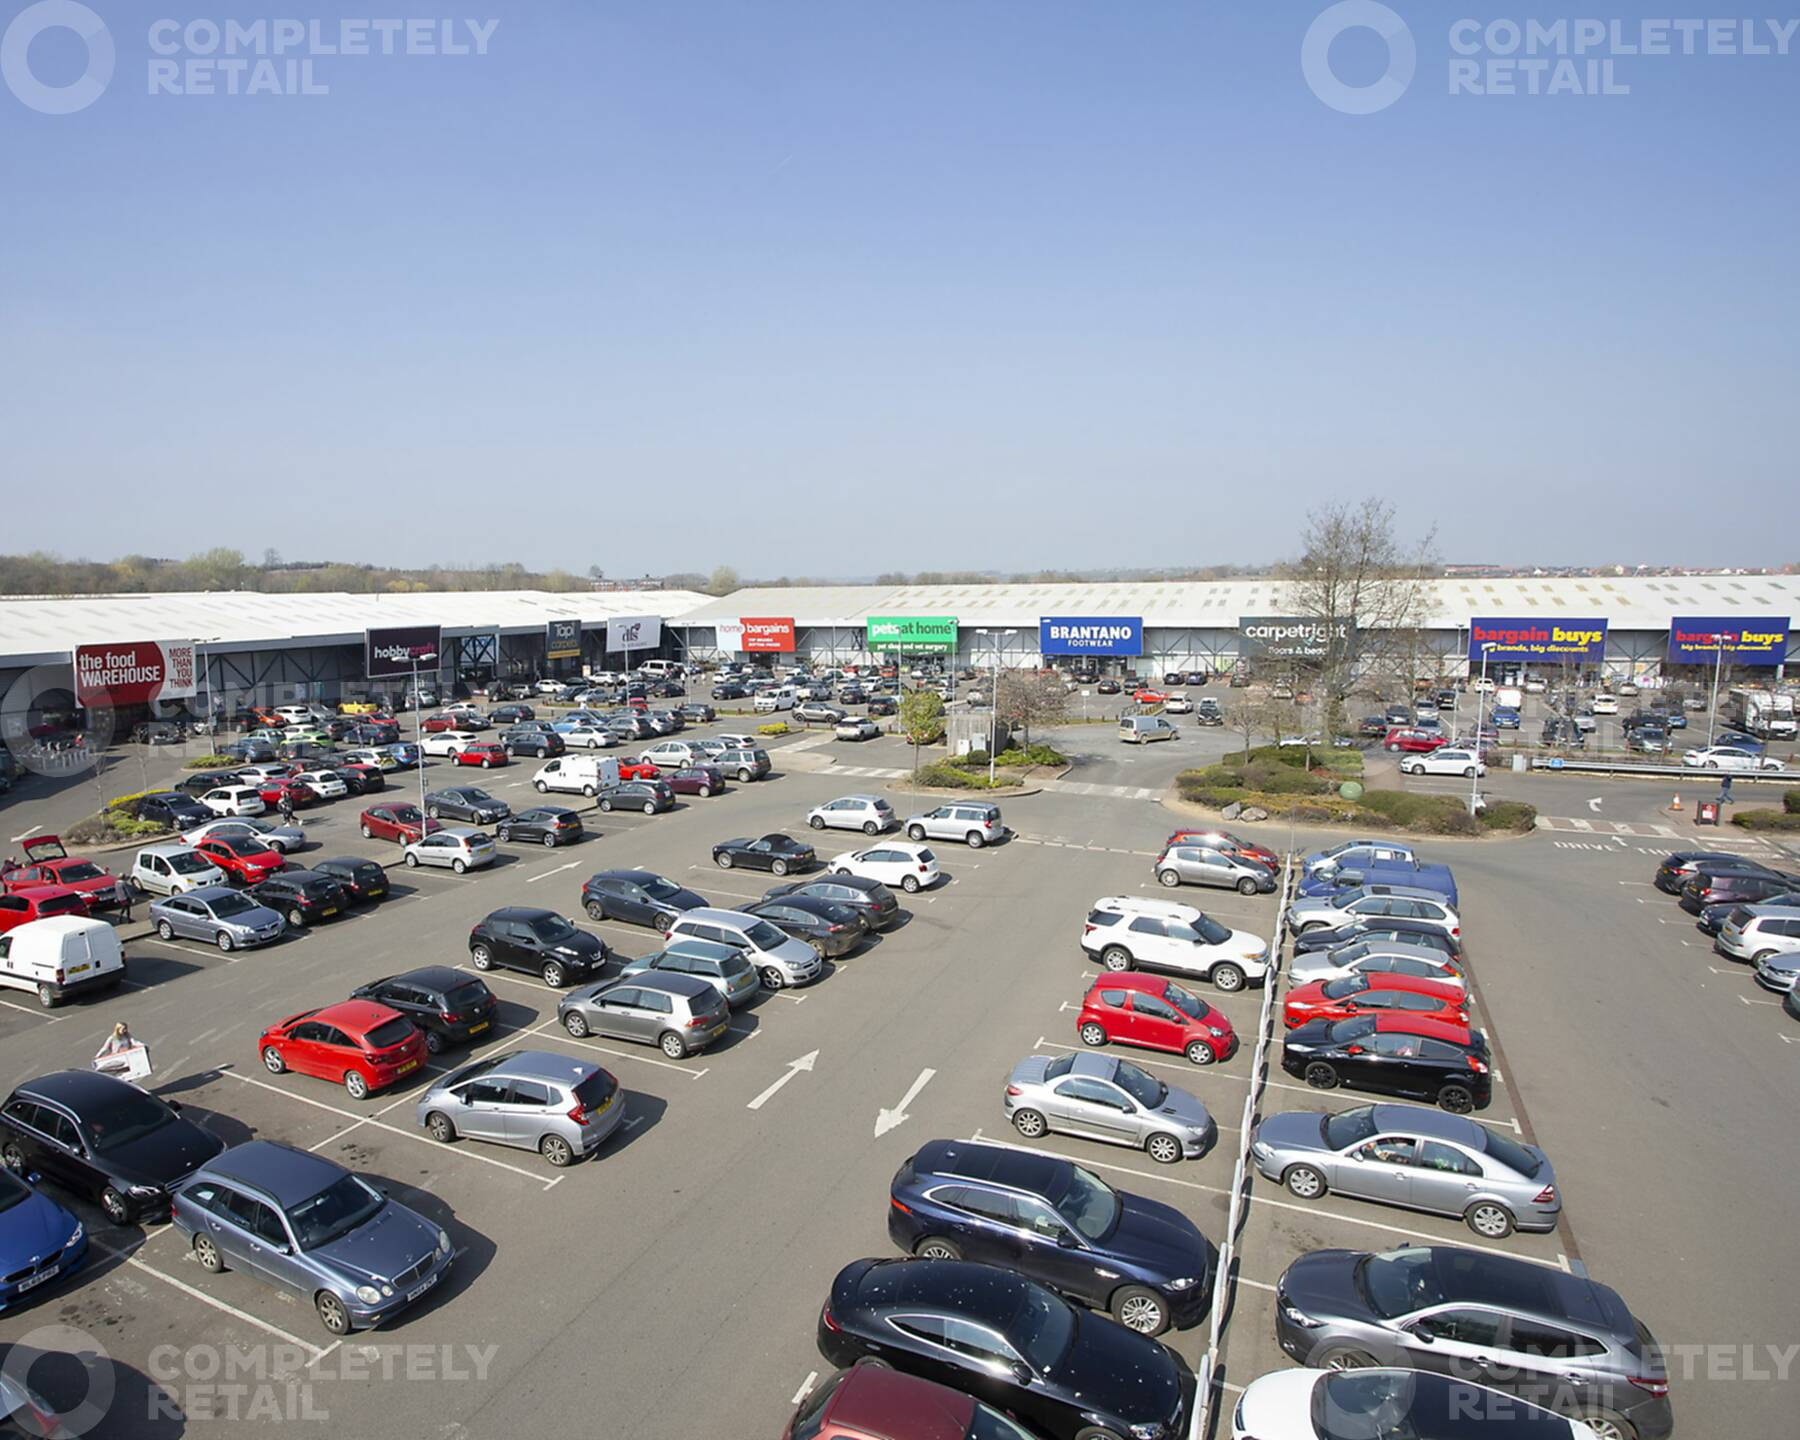 Banbury Cross Retail Park